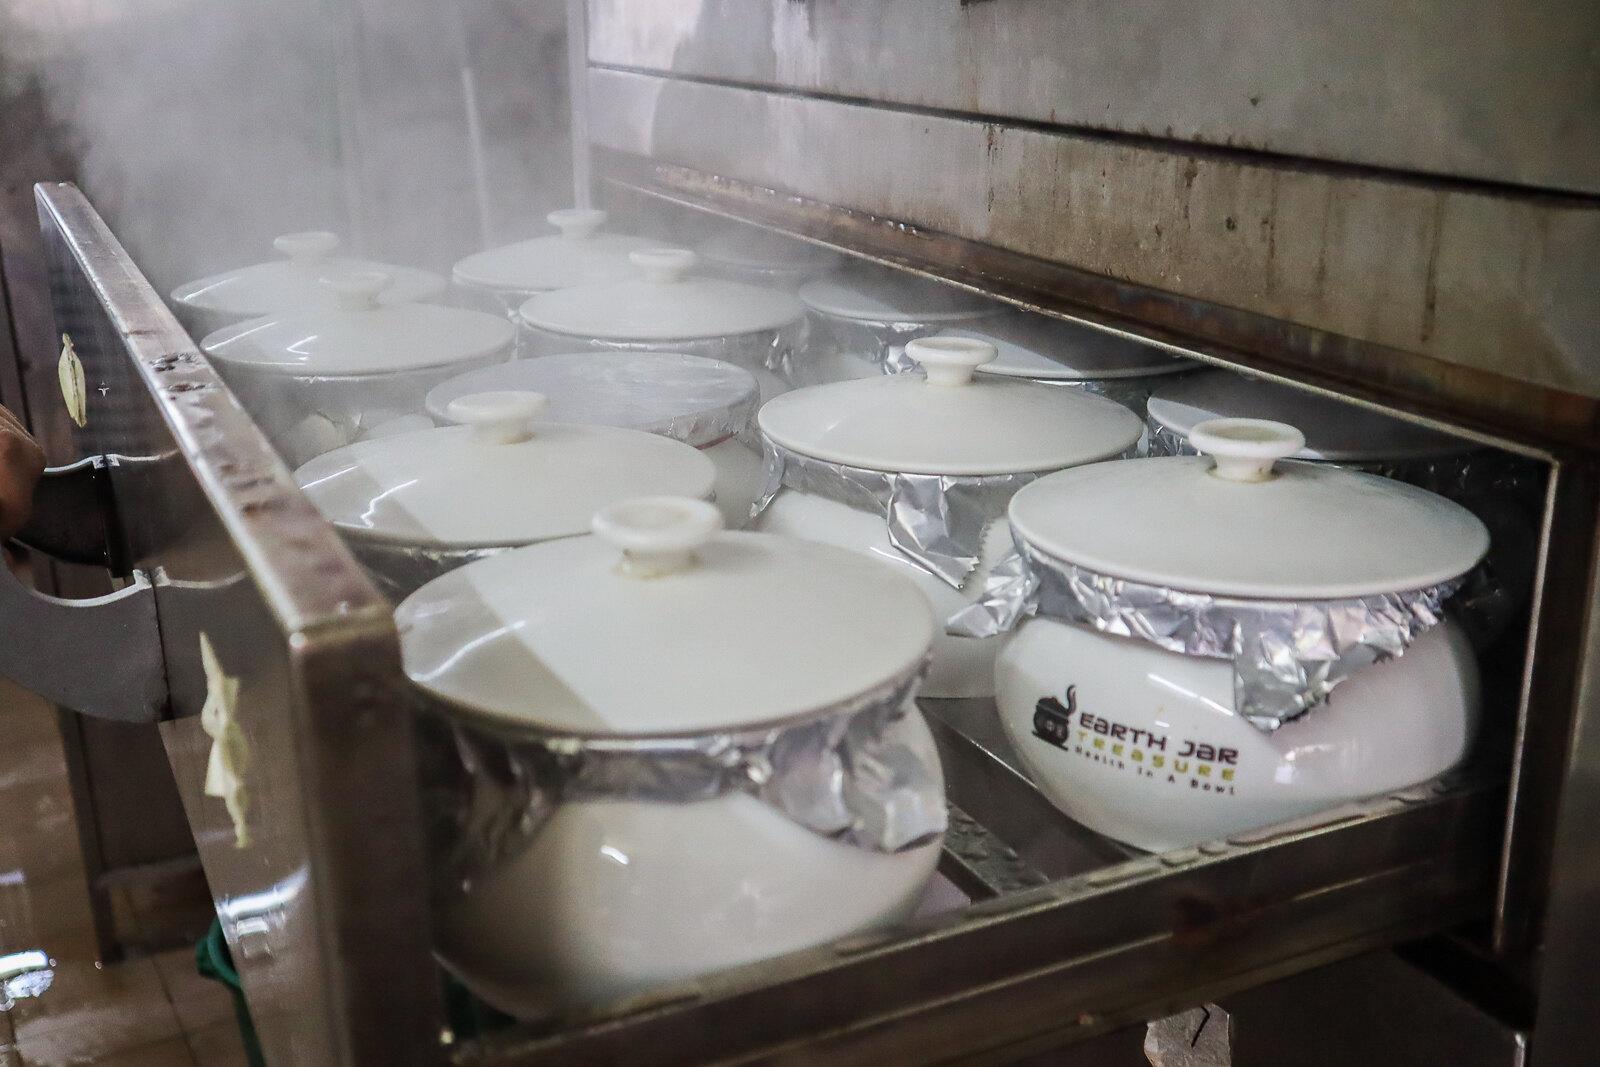 earth jar treasure soup cabinet